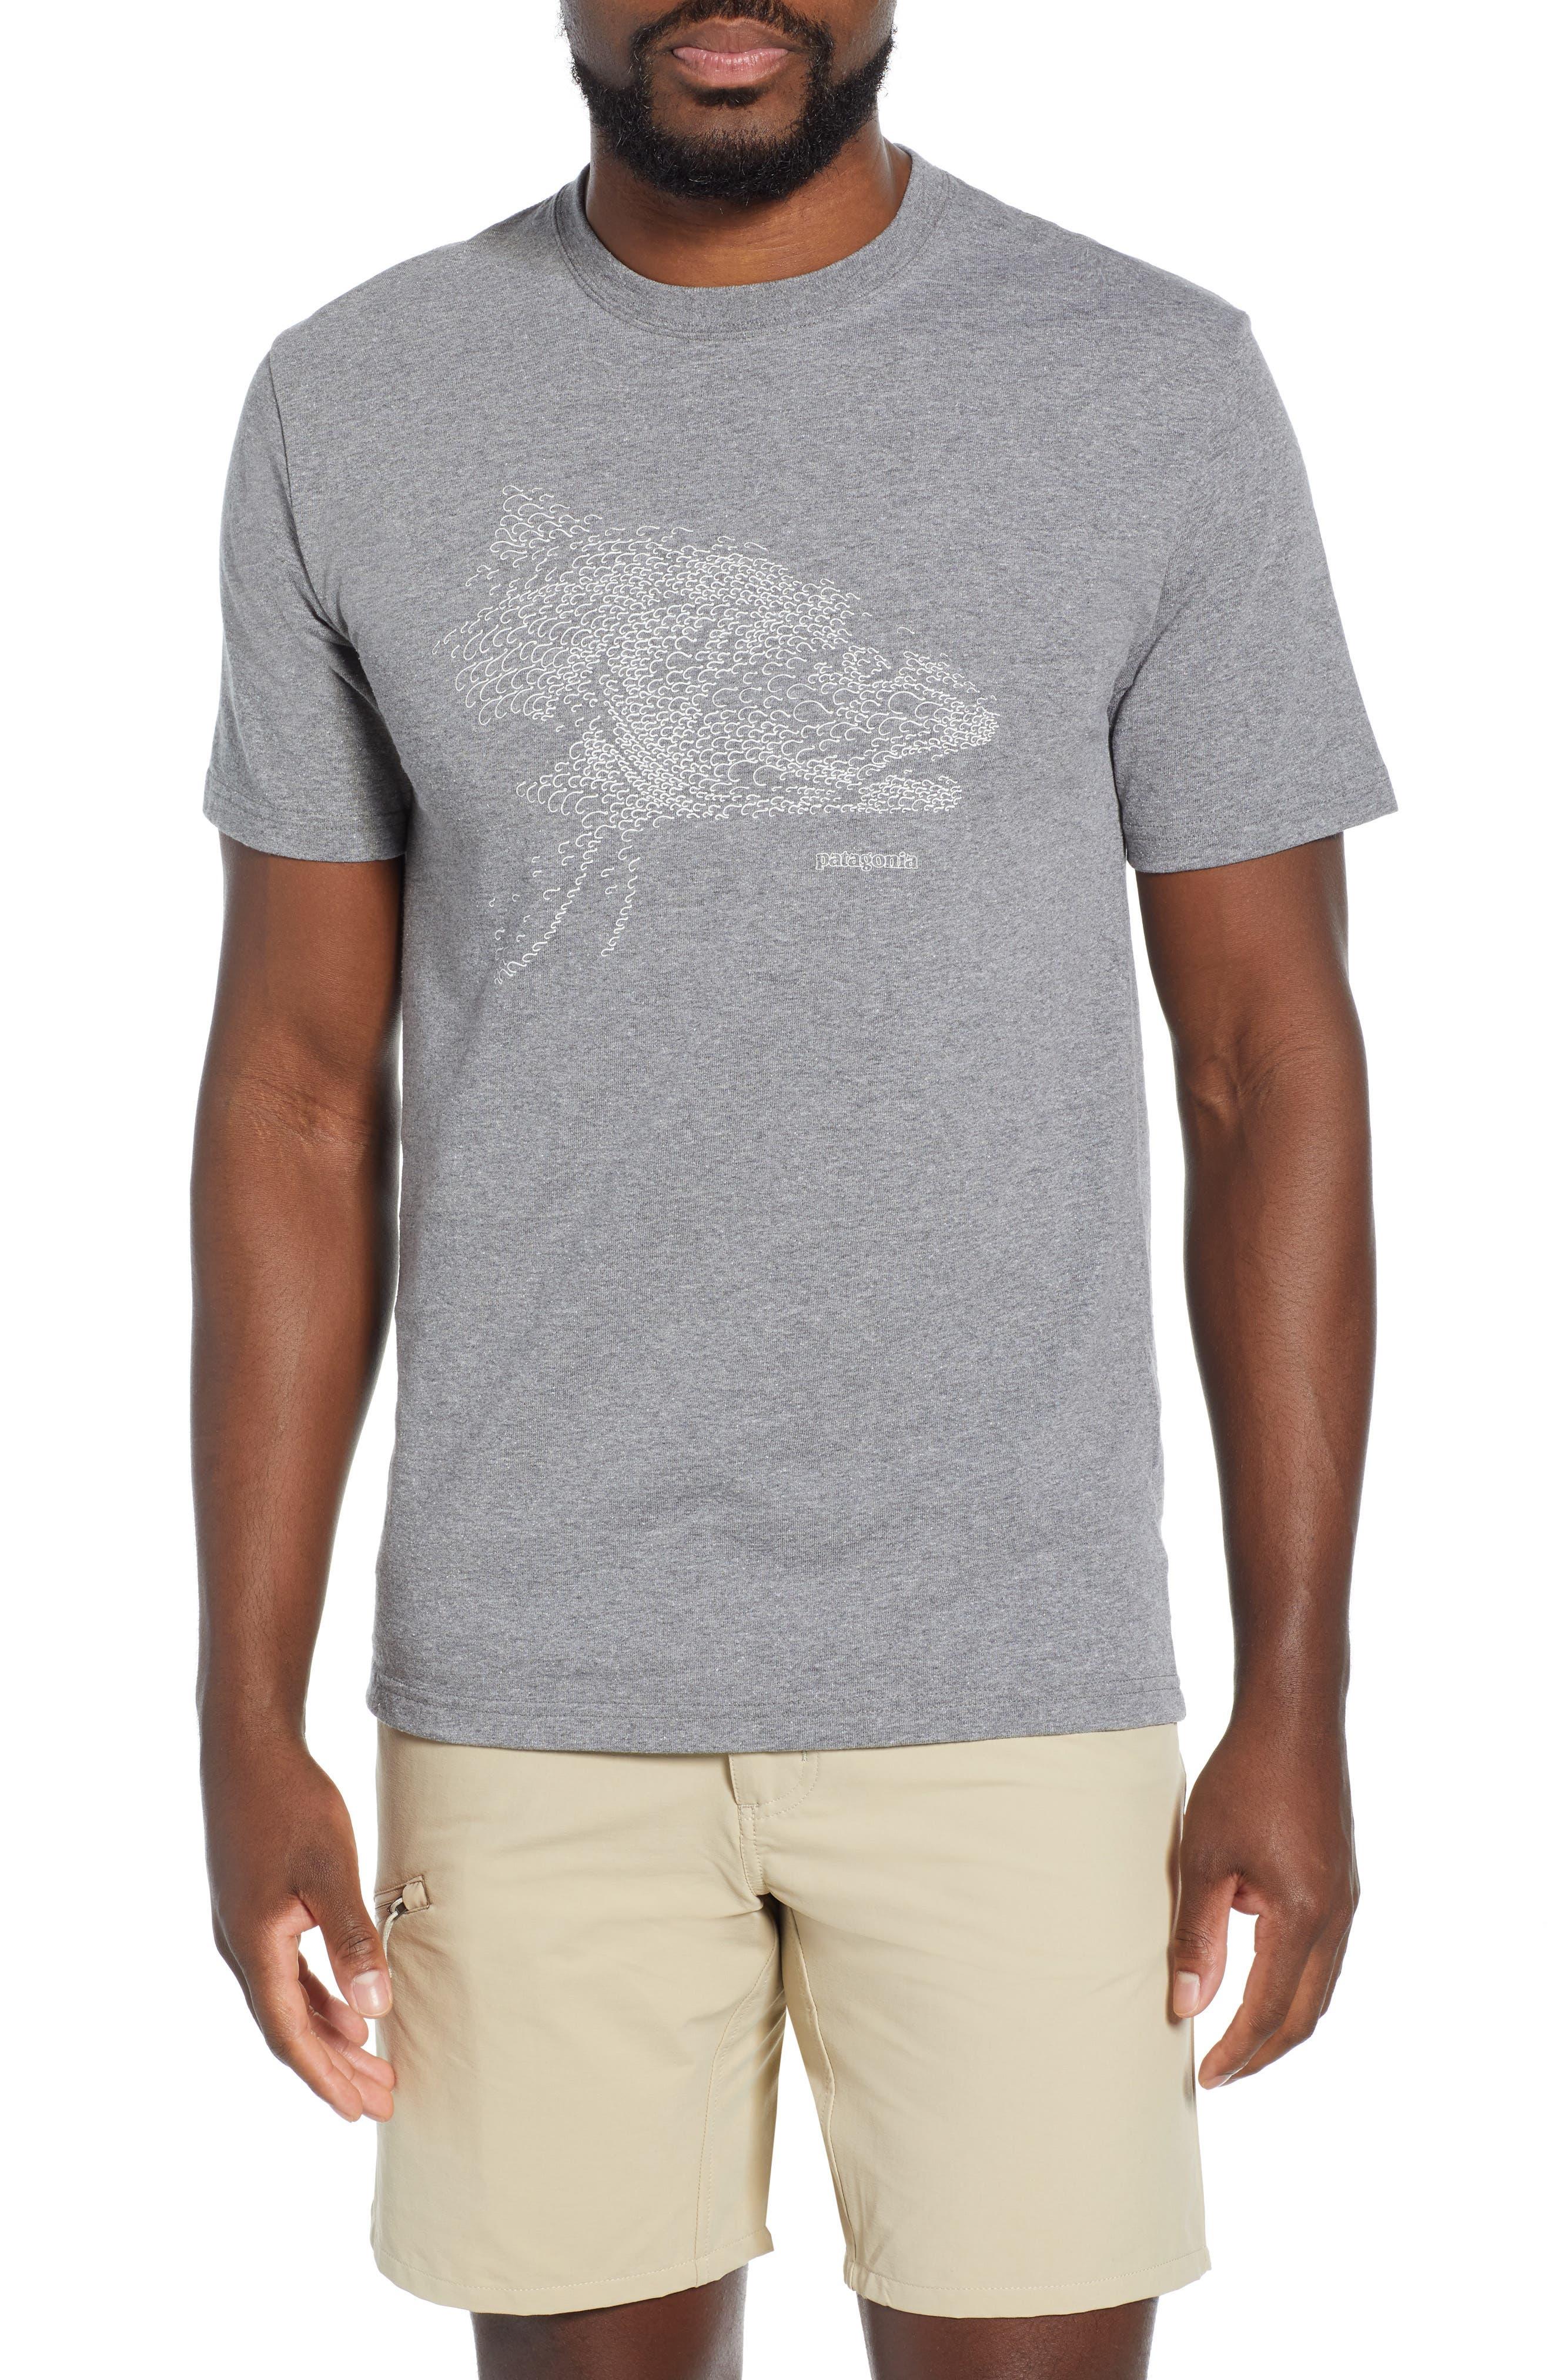 Patagonia Hooked Head Responsibili-Tee T-Shirt, Grey